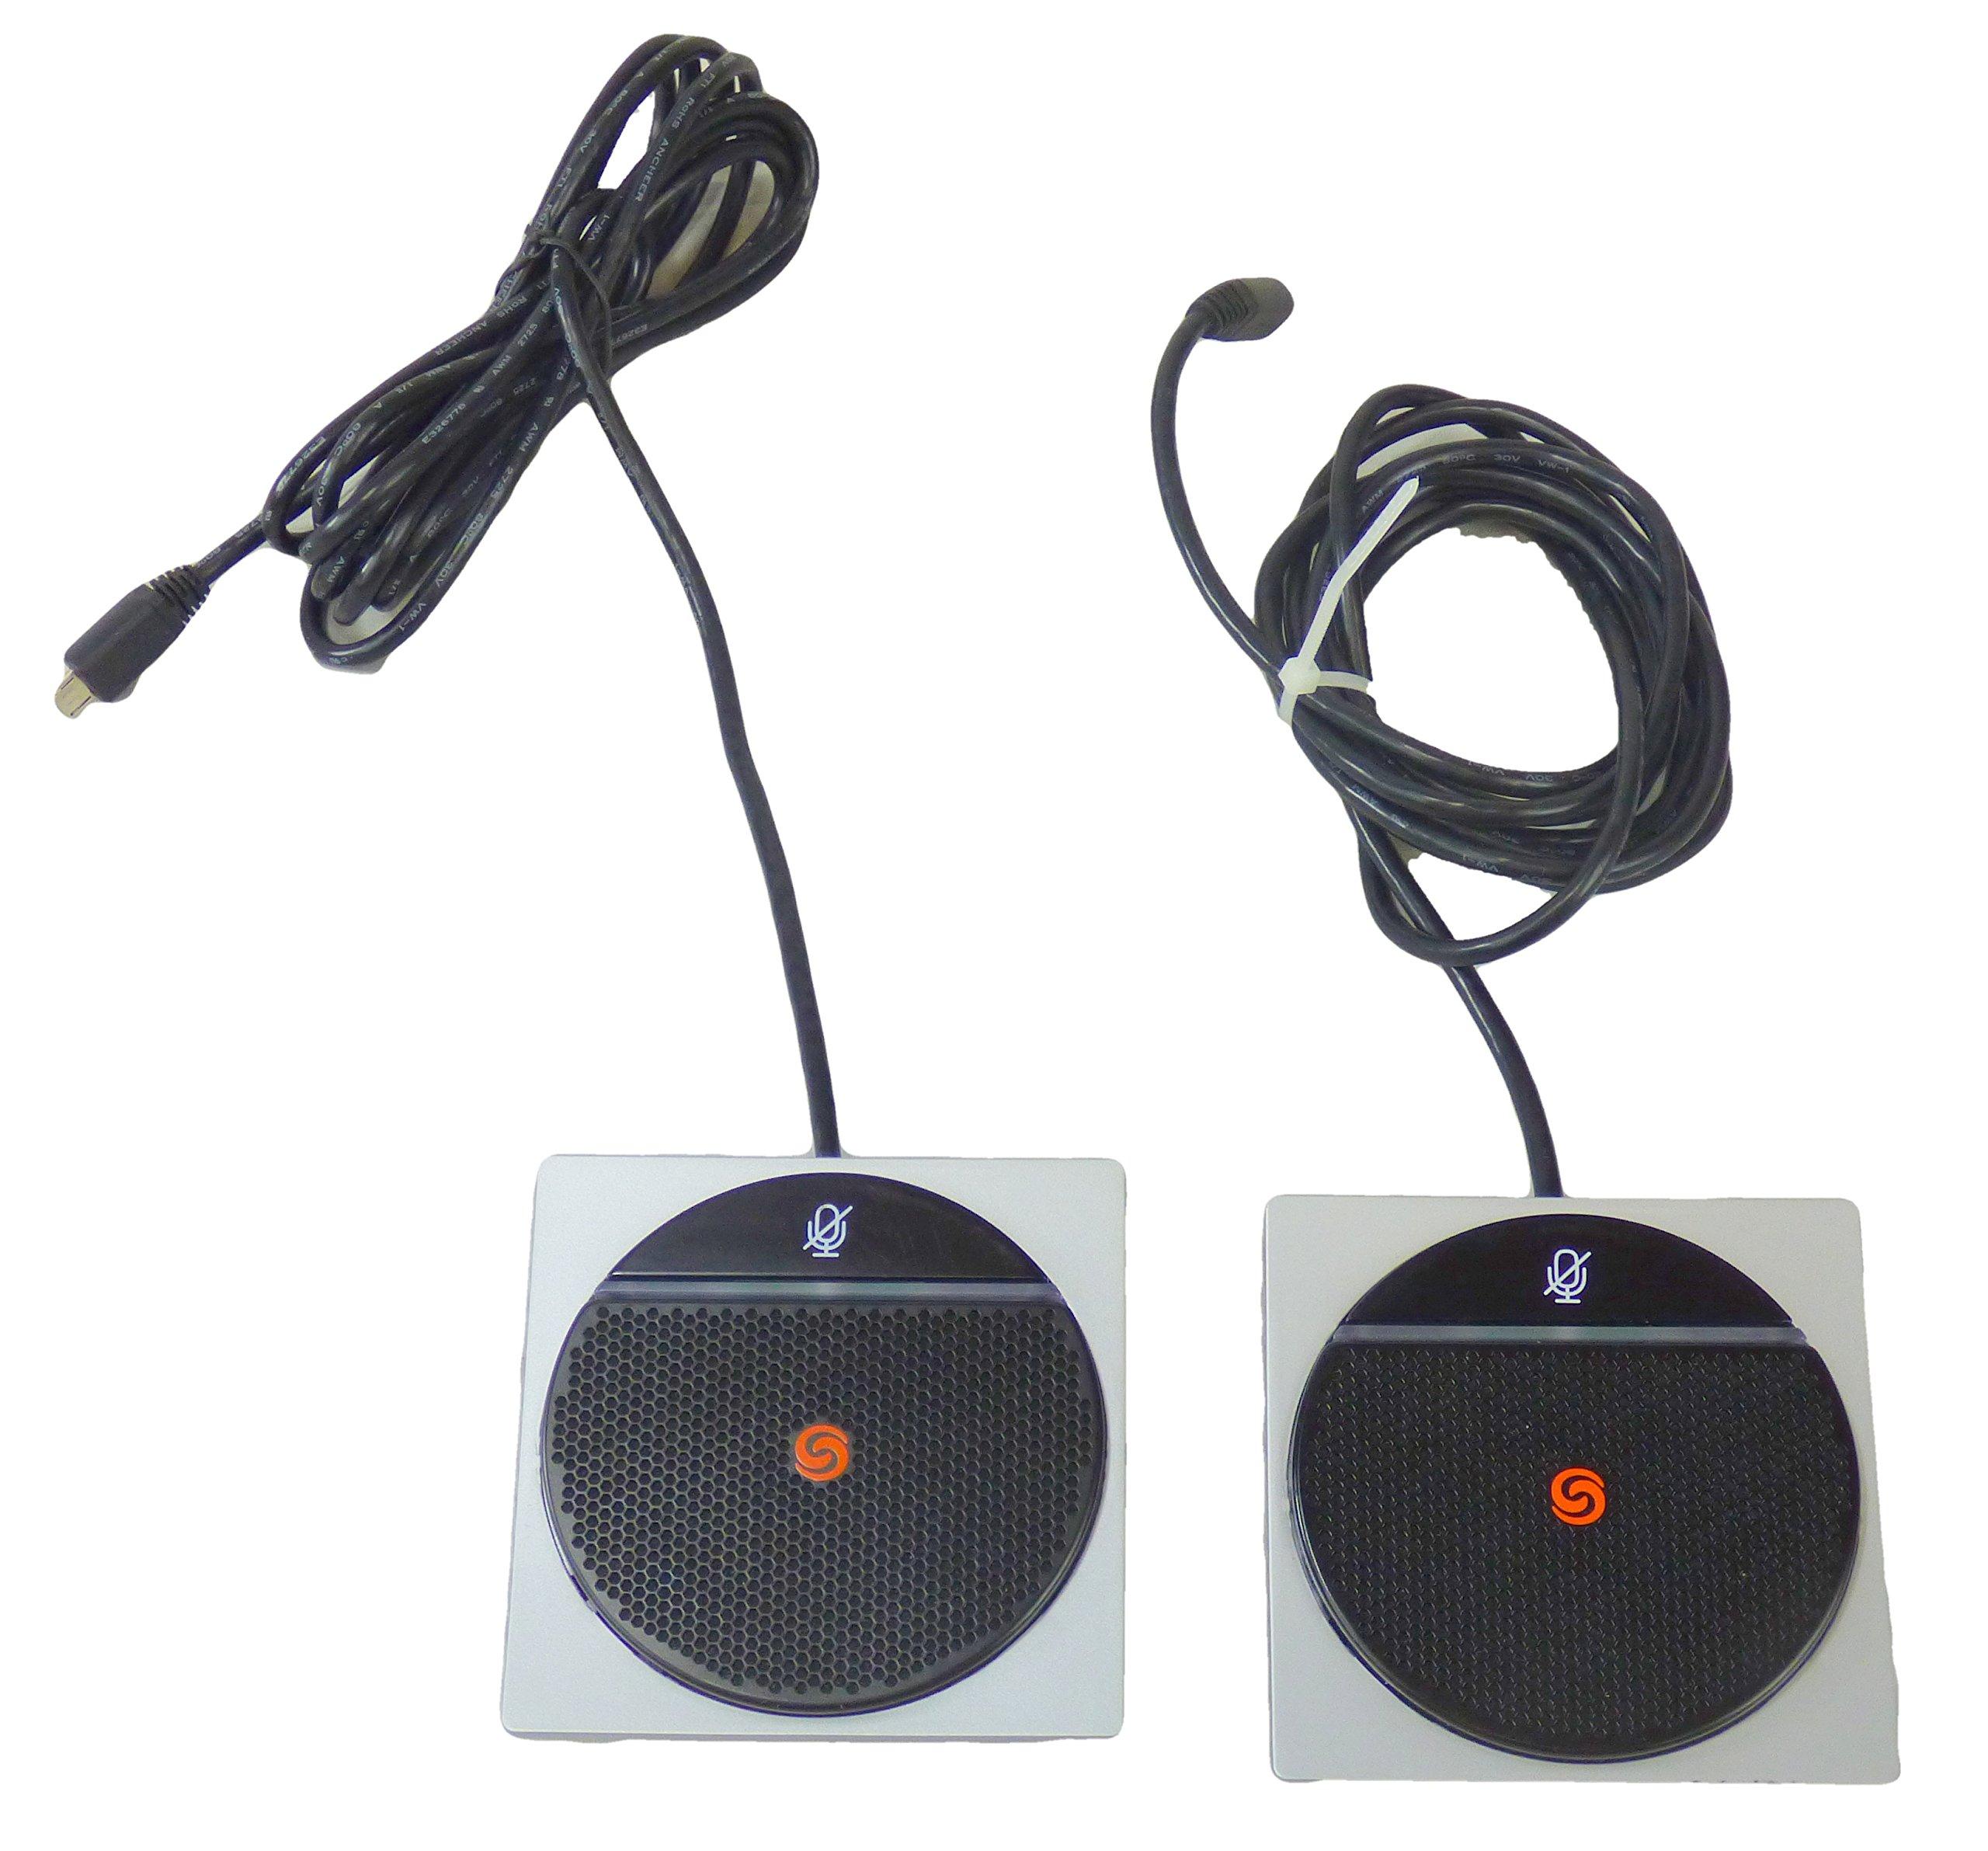 Shoretel Satellite External Microphones SM-1 (10401)